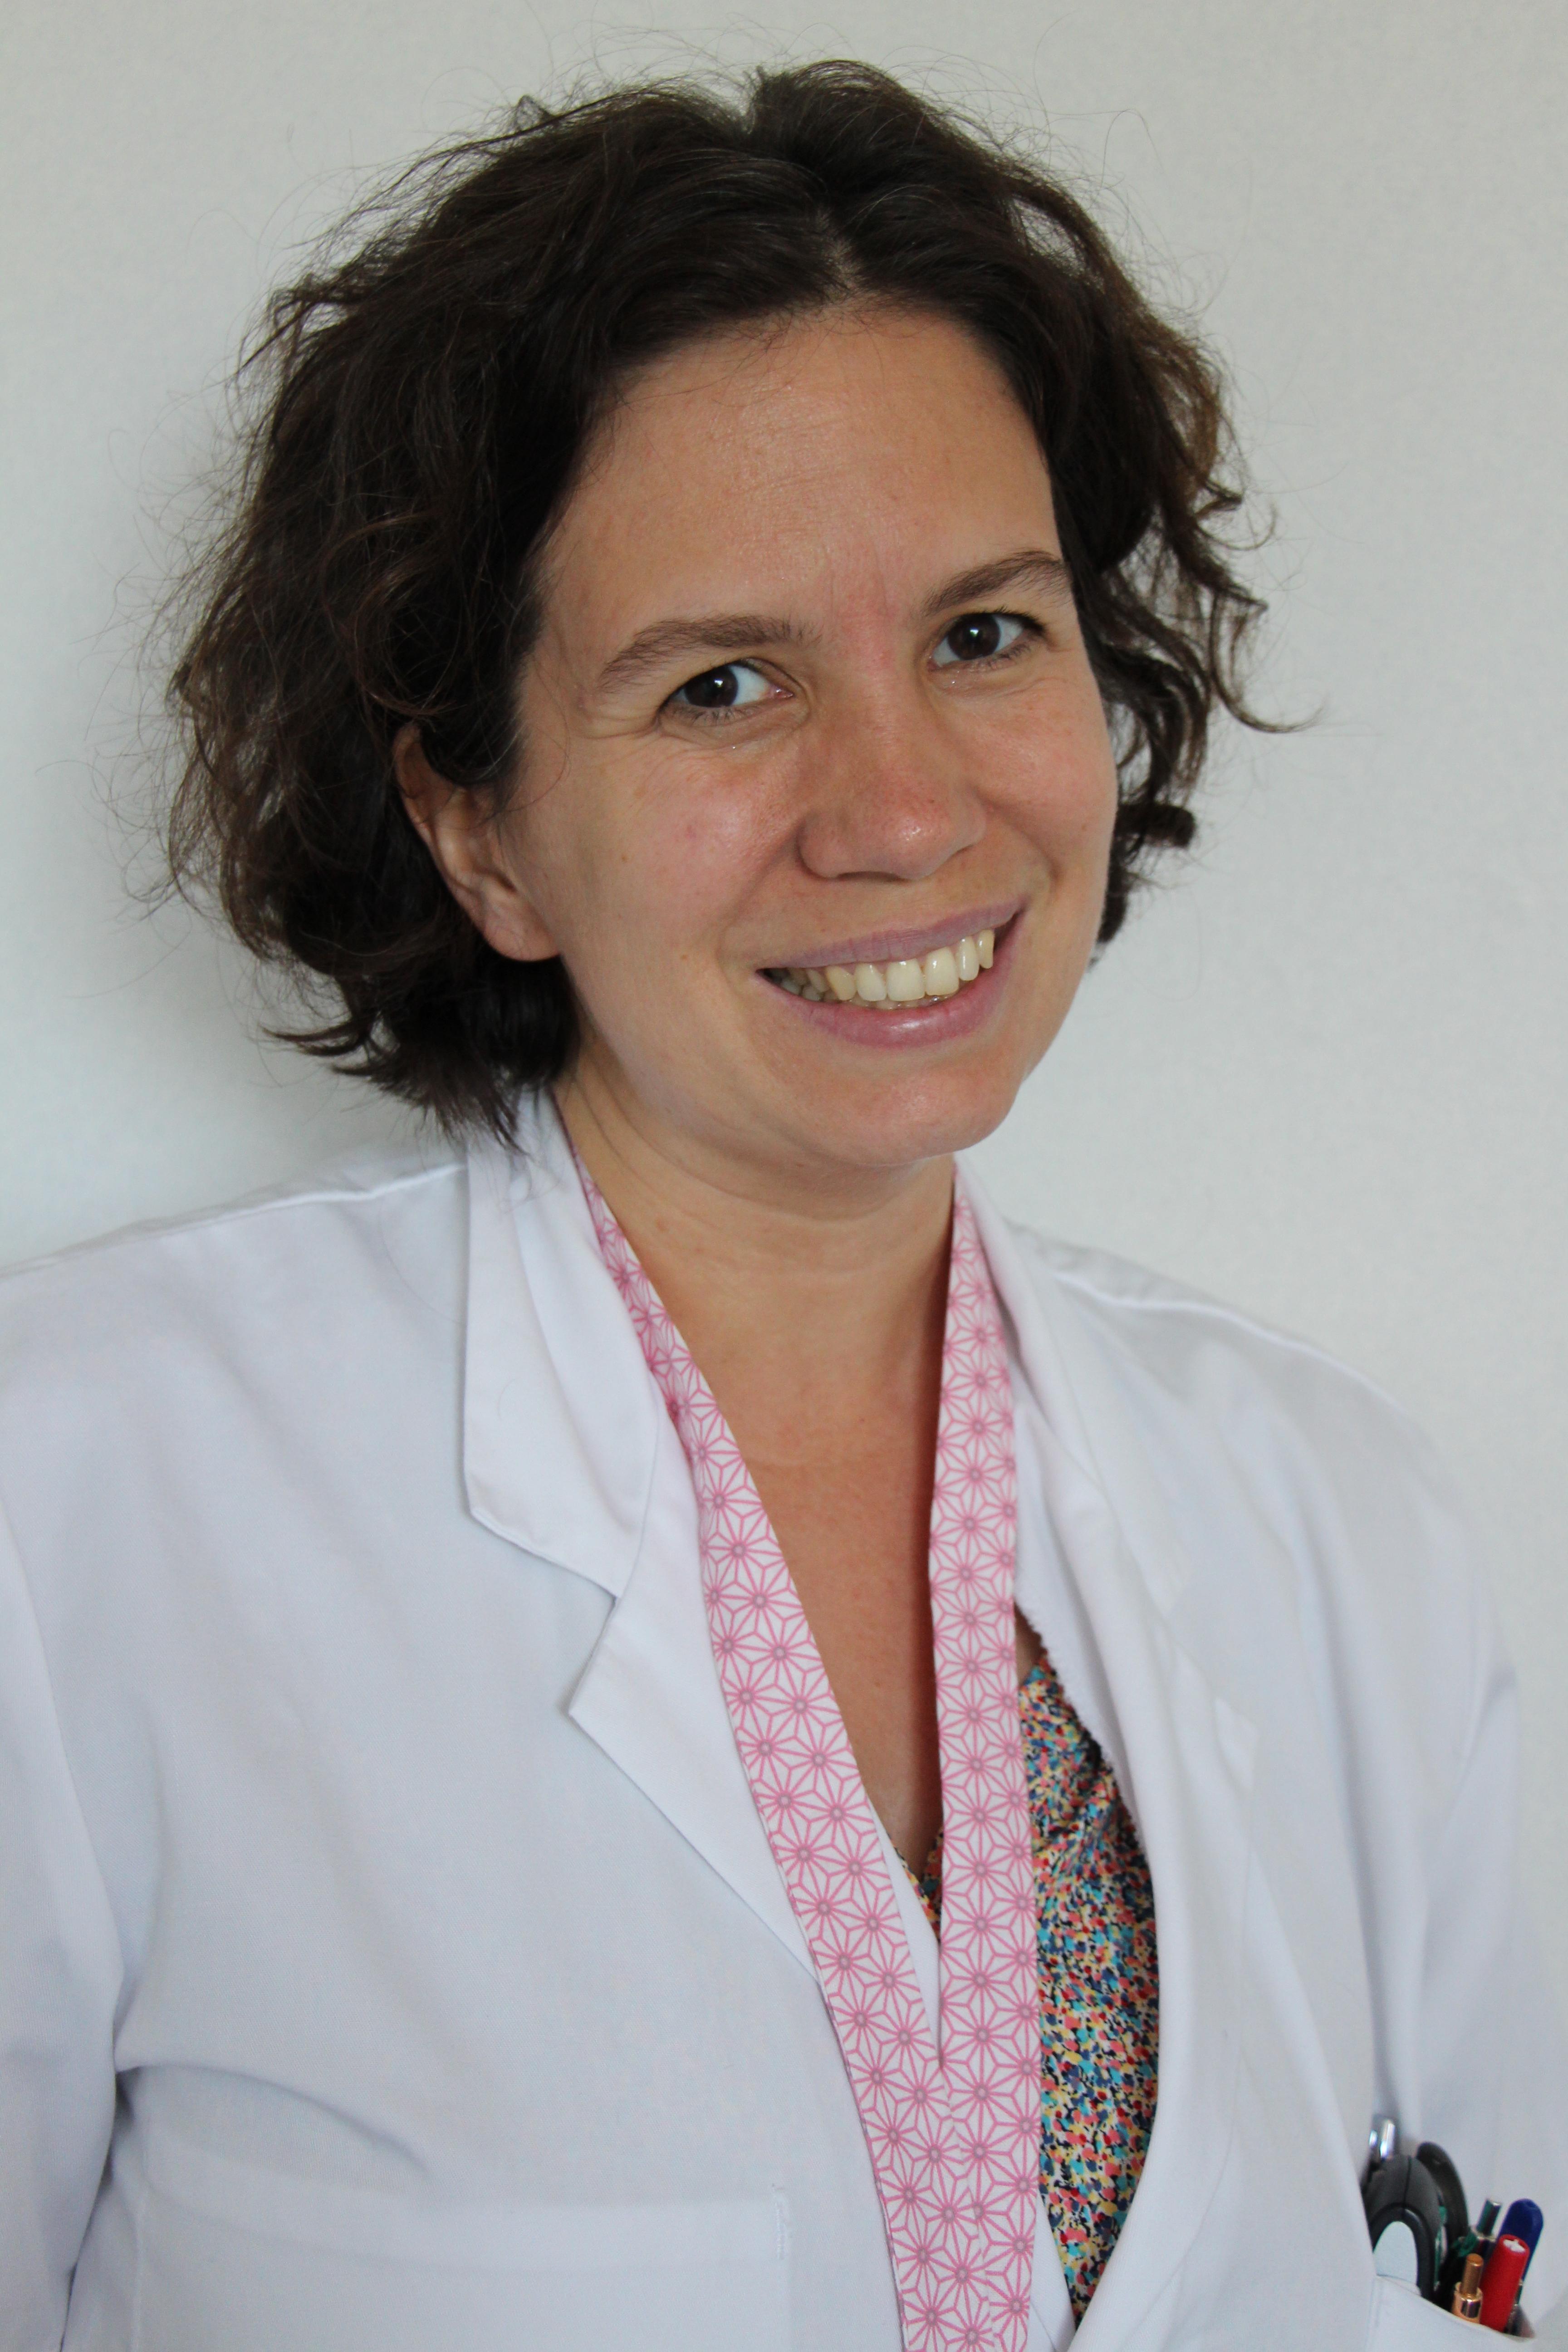 sante-maternite-grossesse-accouchement-hopital-neuilly